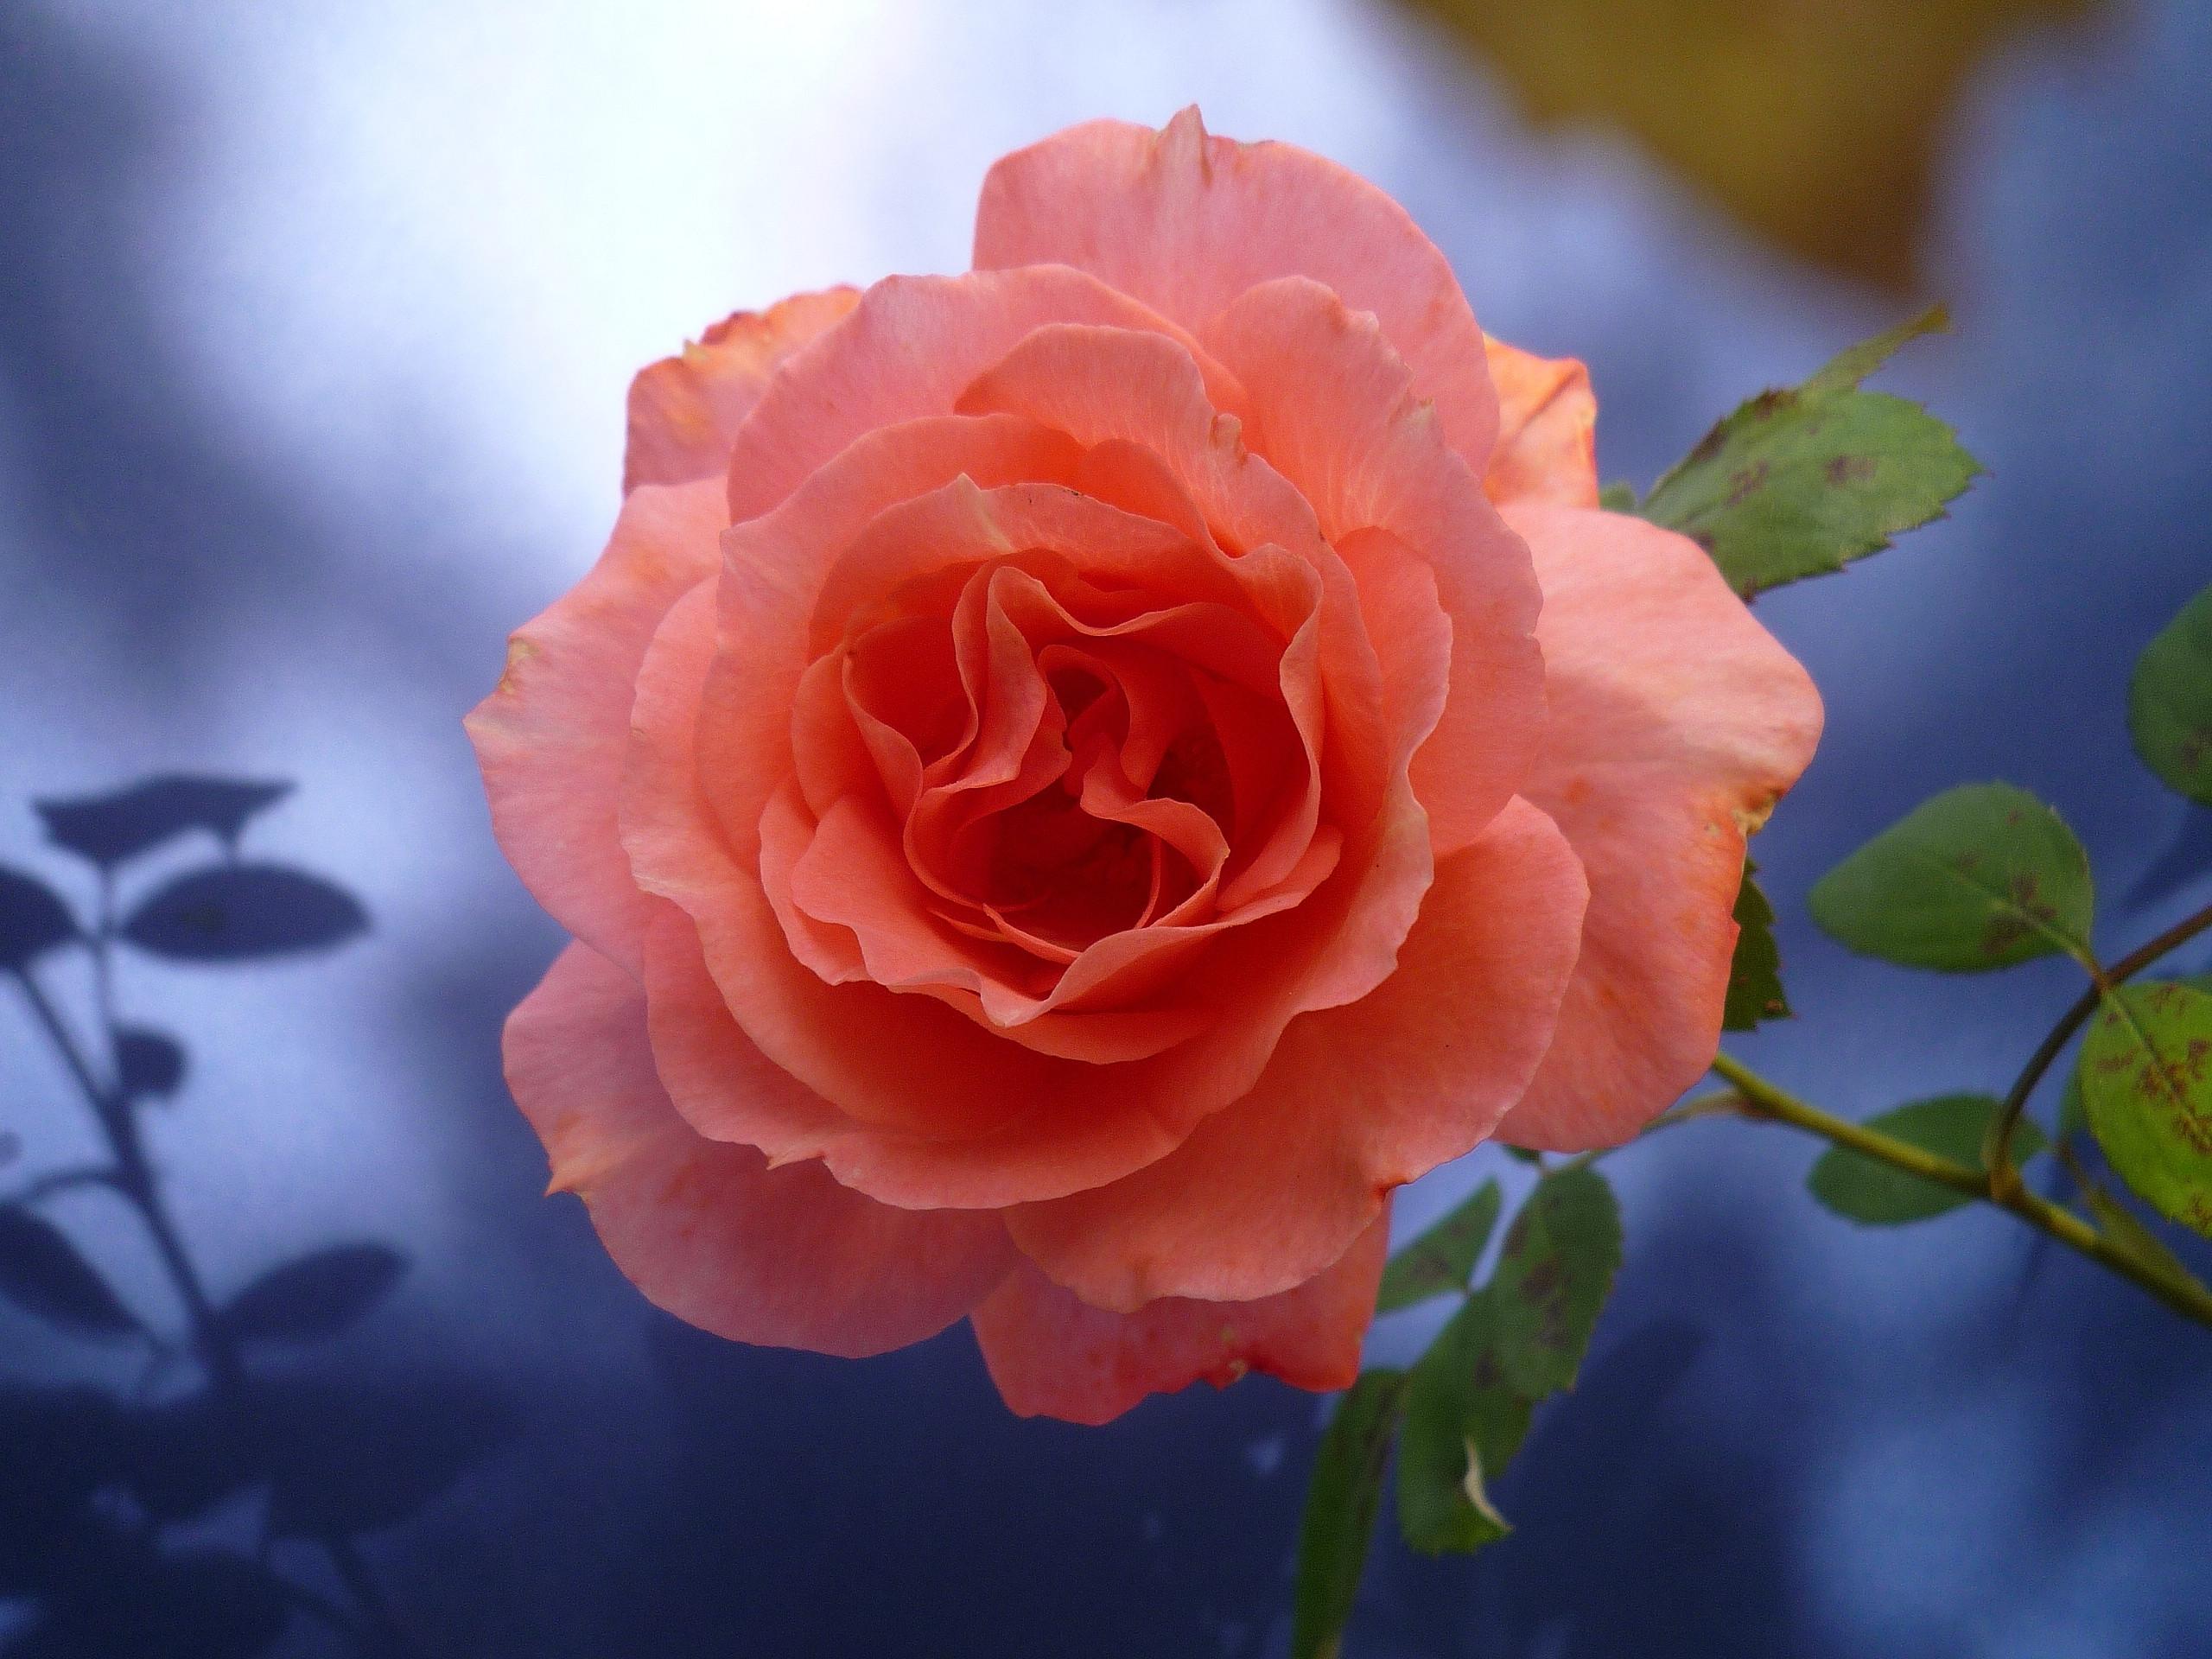 обои роза, розы, цветок, цветы картинки фото